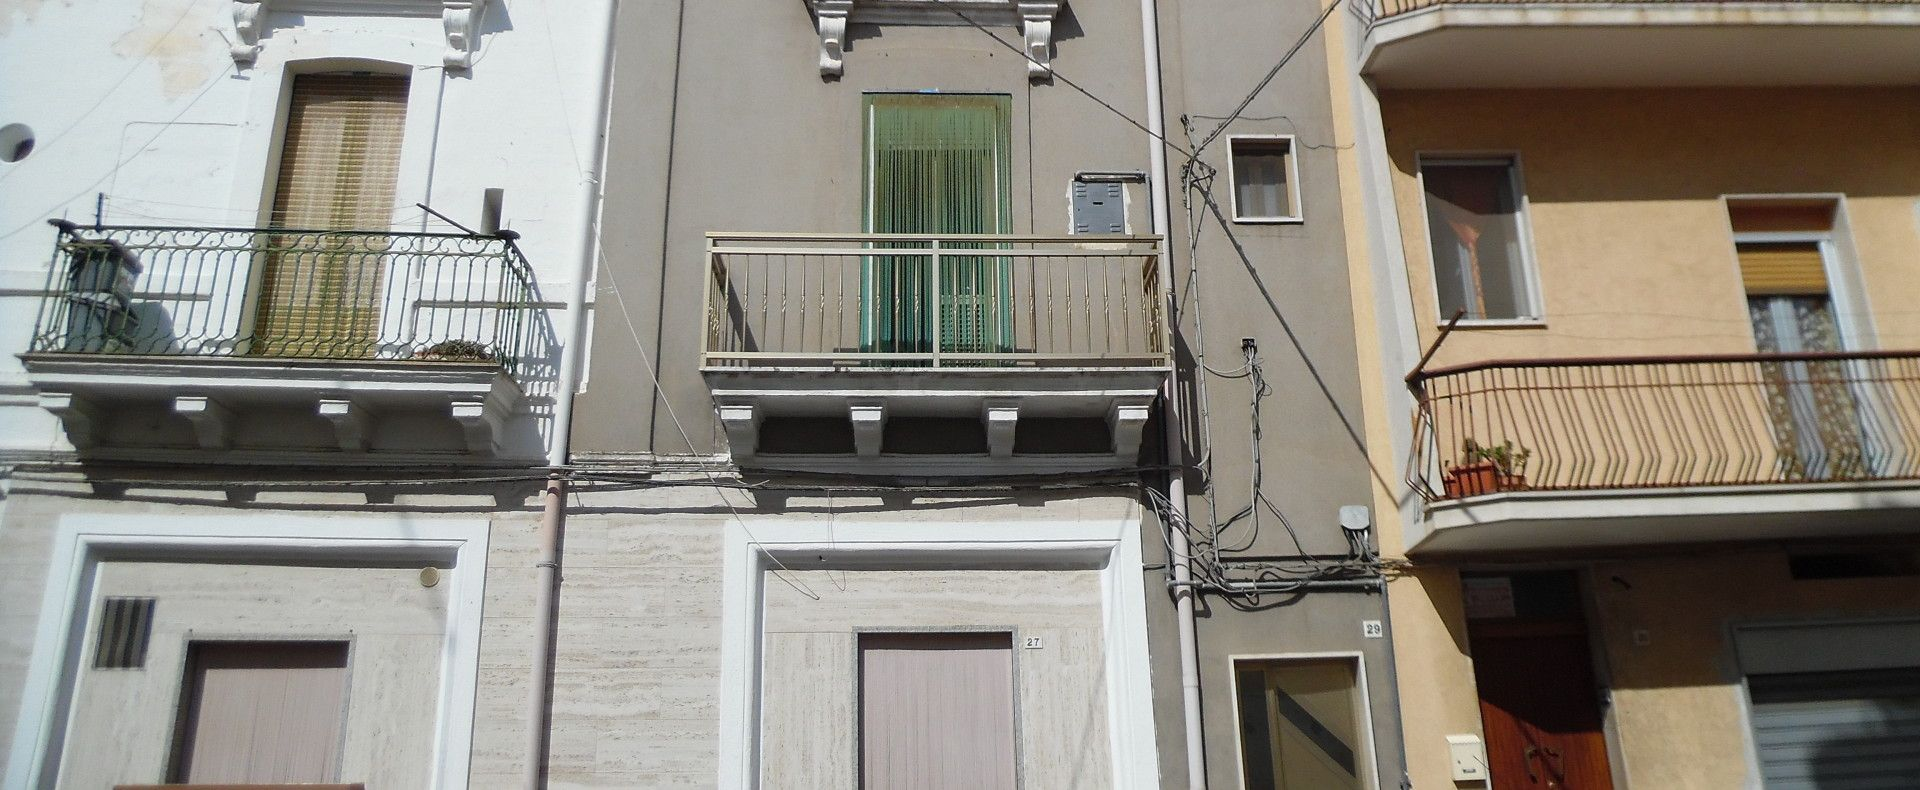 Appartamento via Mafalda di Savoia Grottaglie